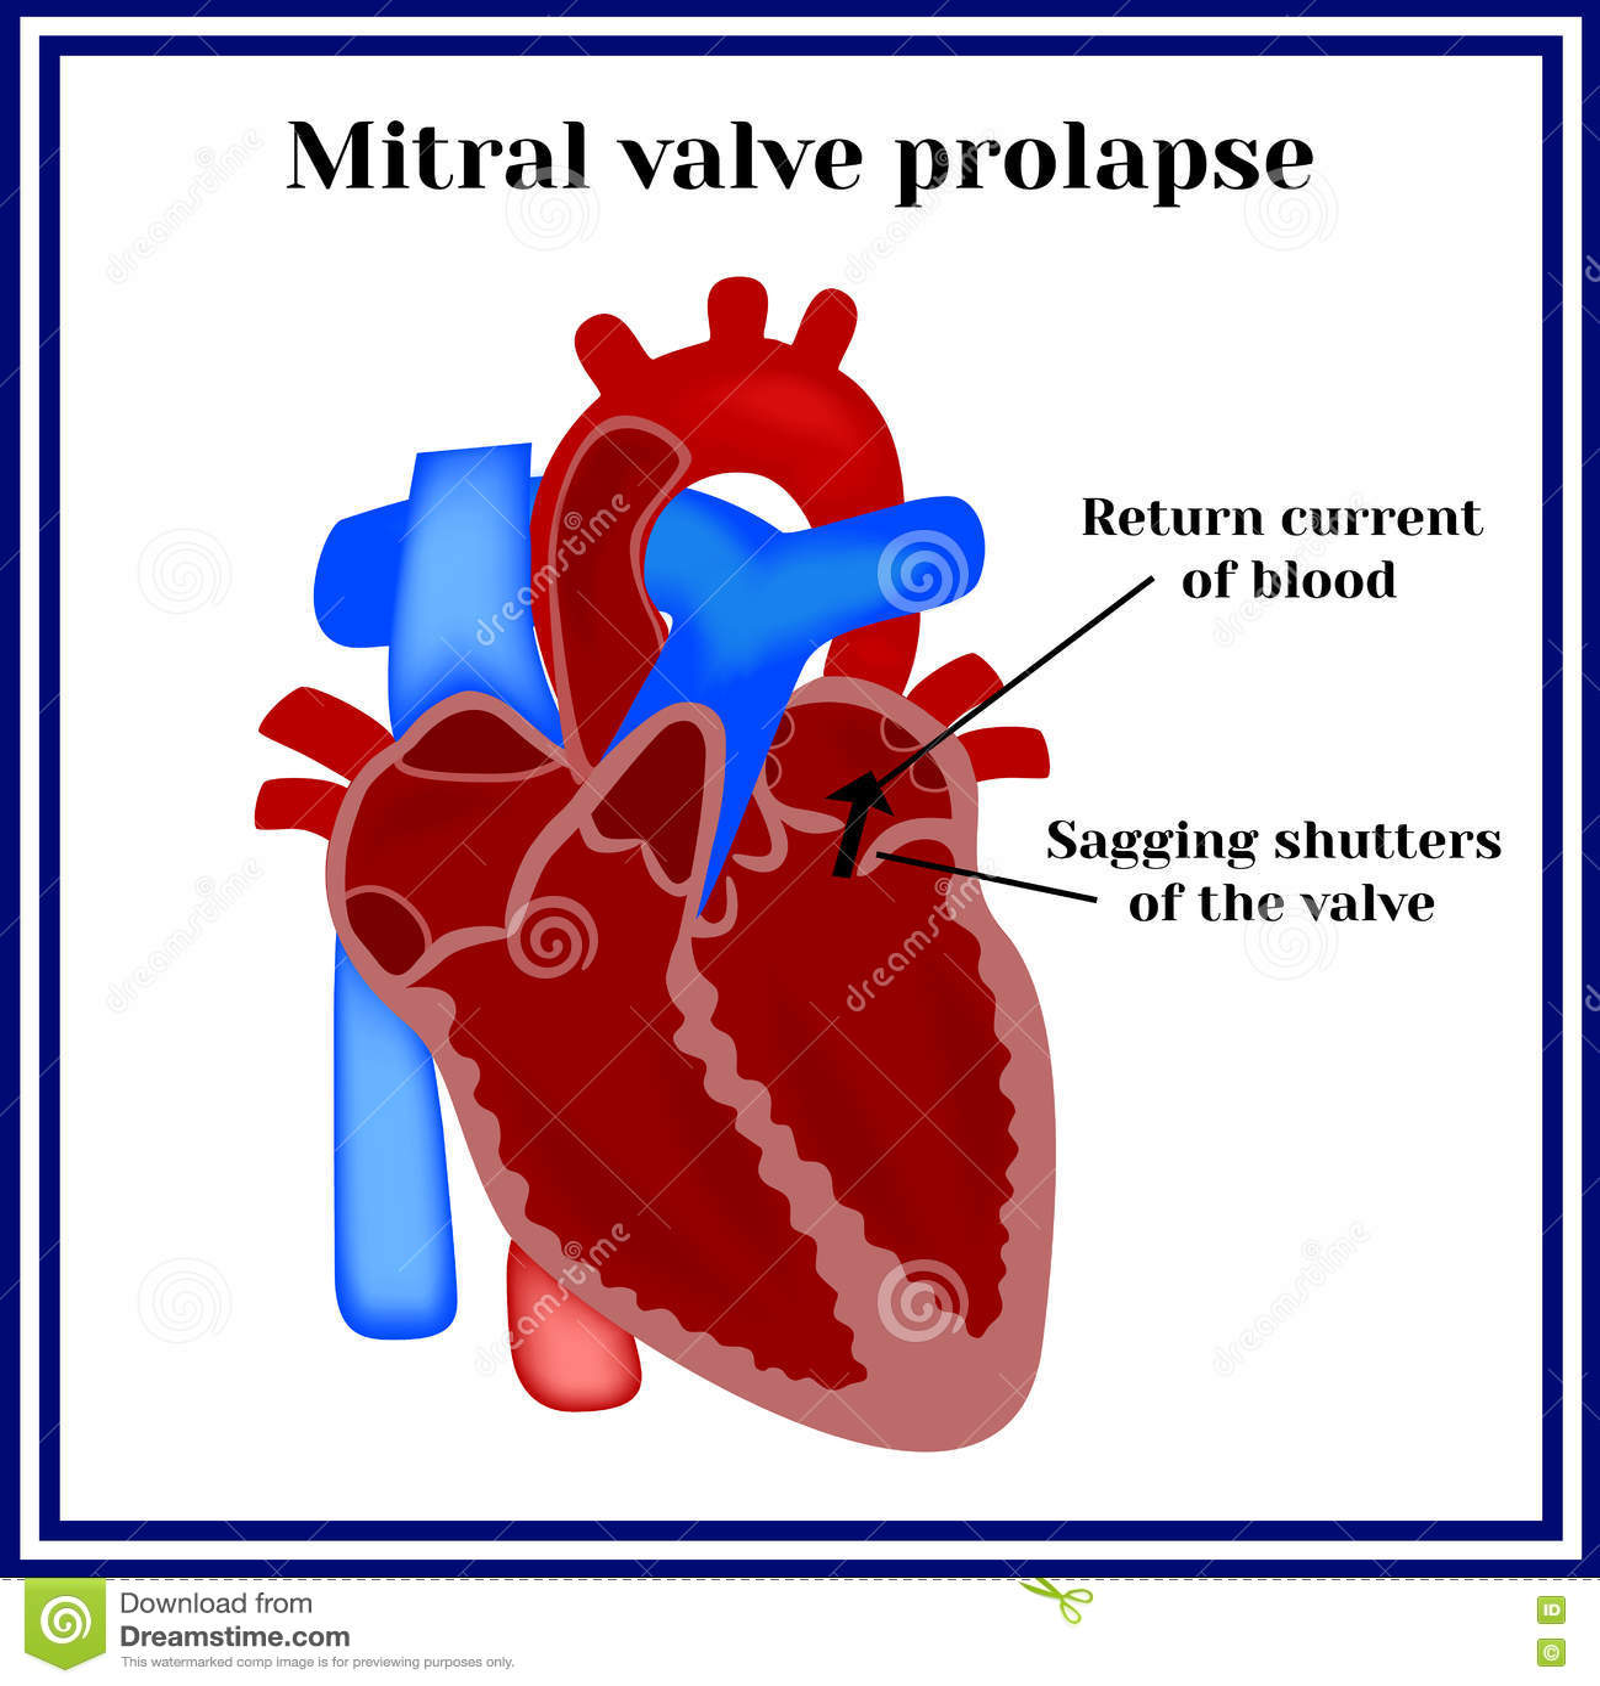 Prolapse Mitral Valve Anatomy